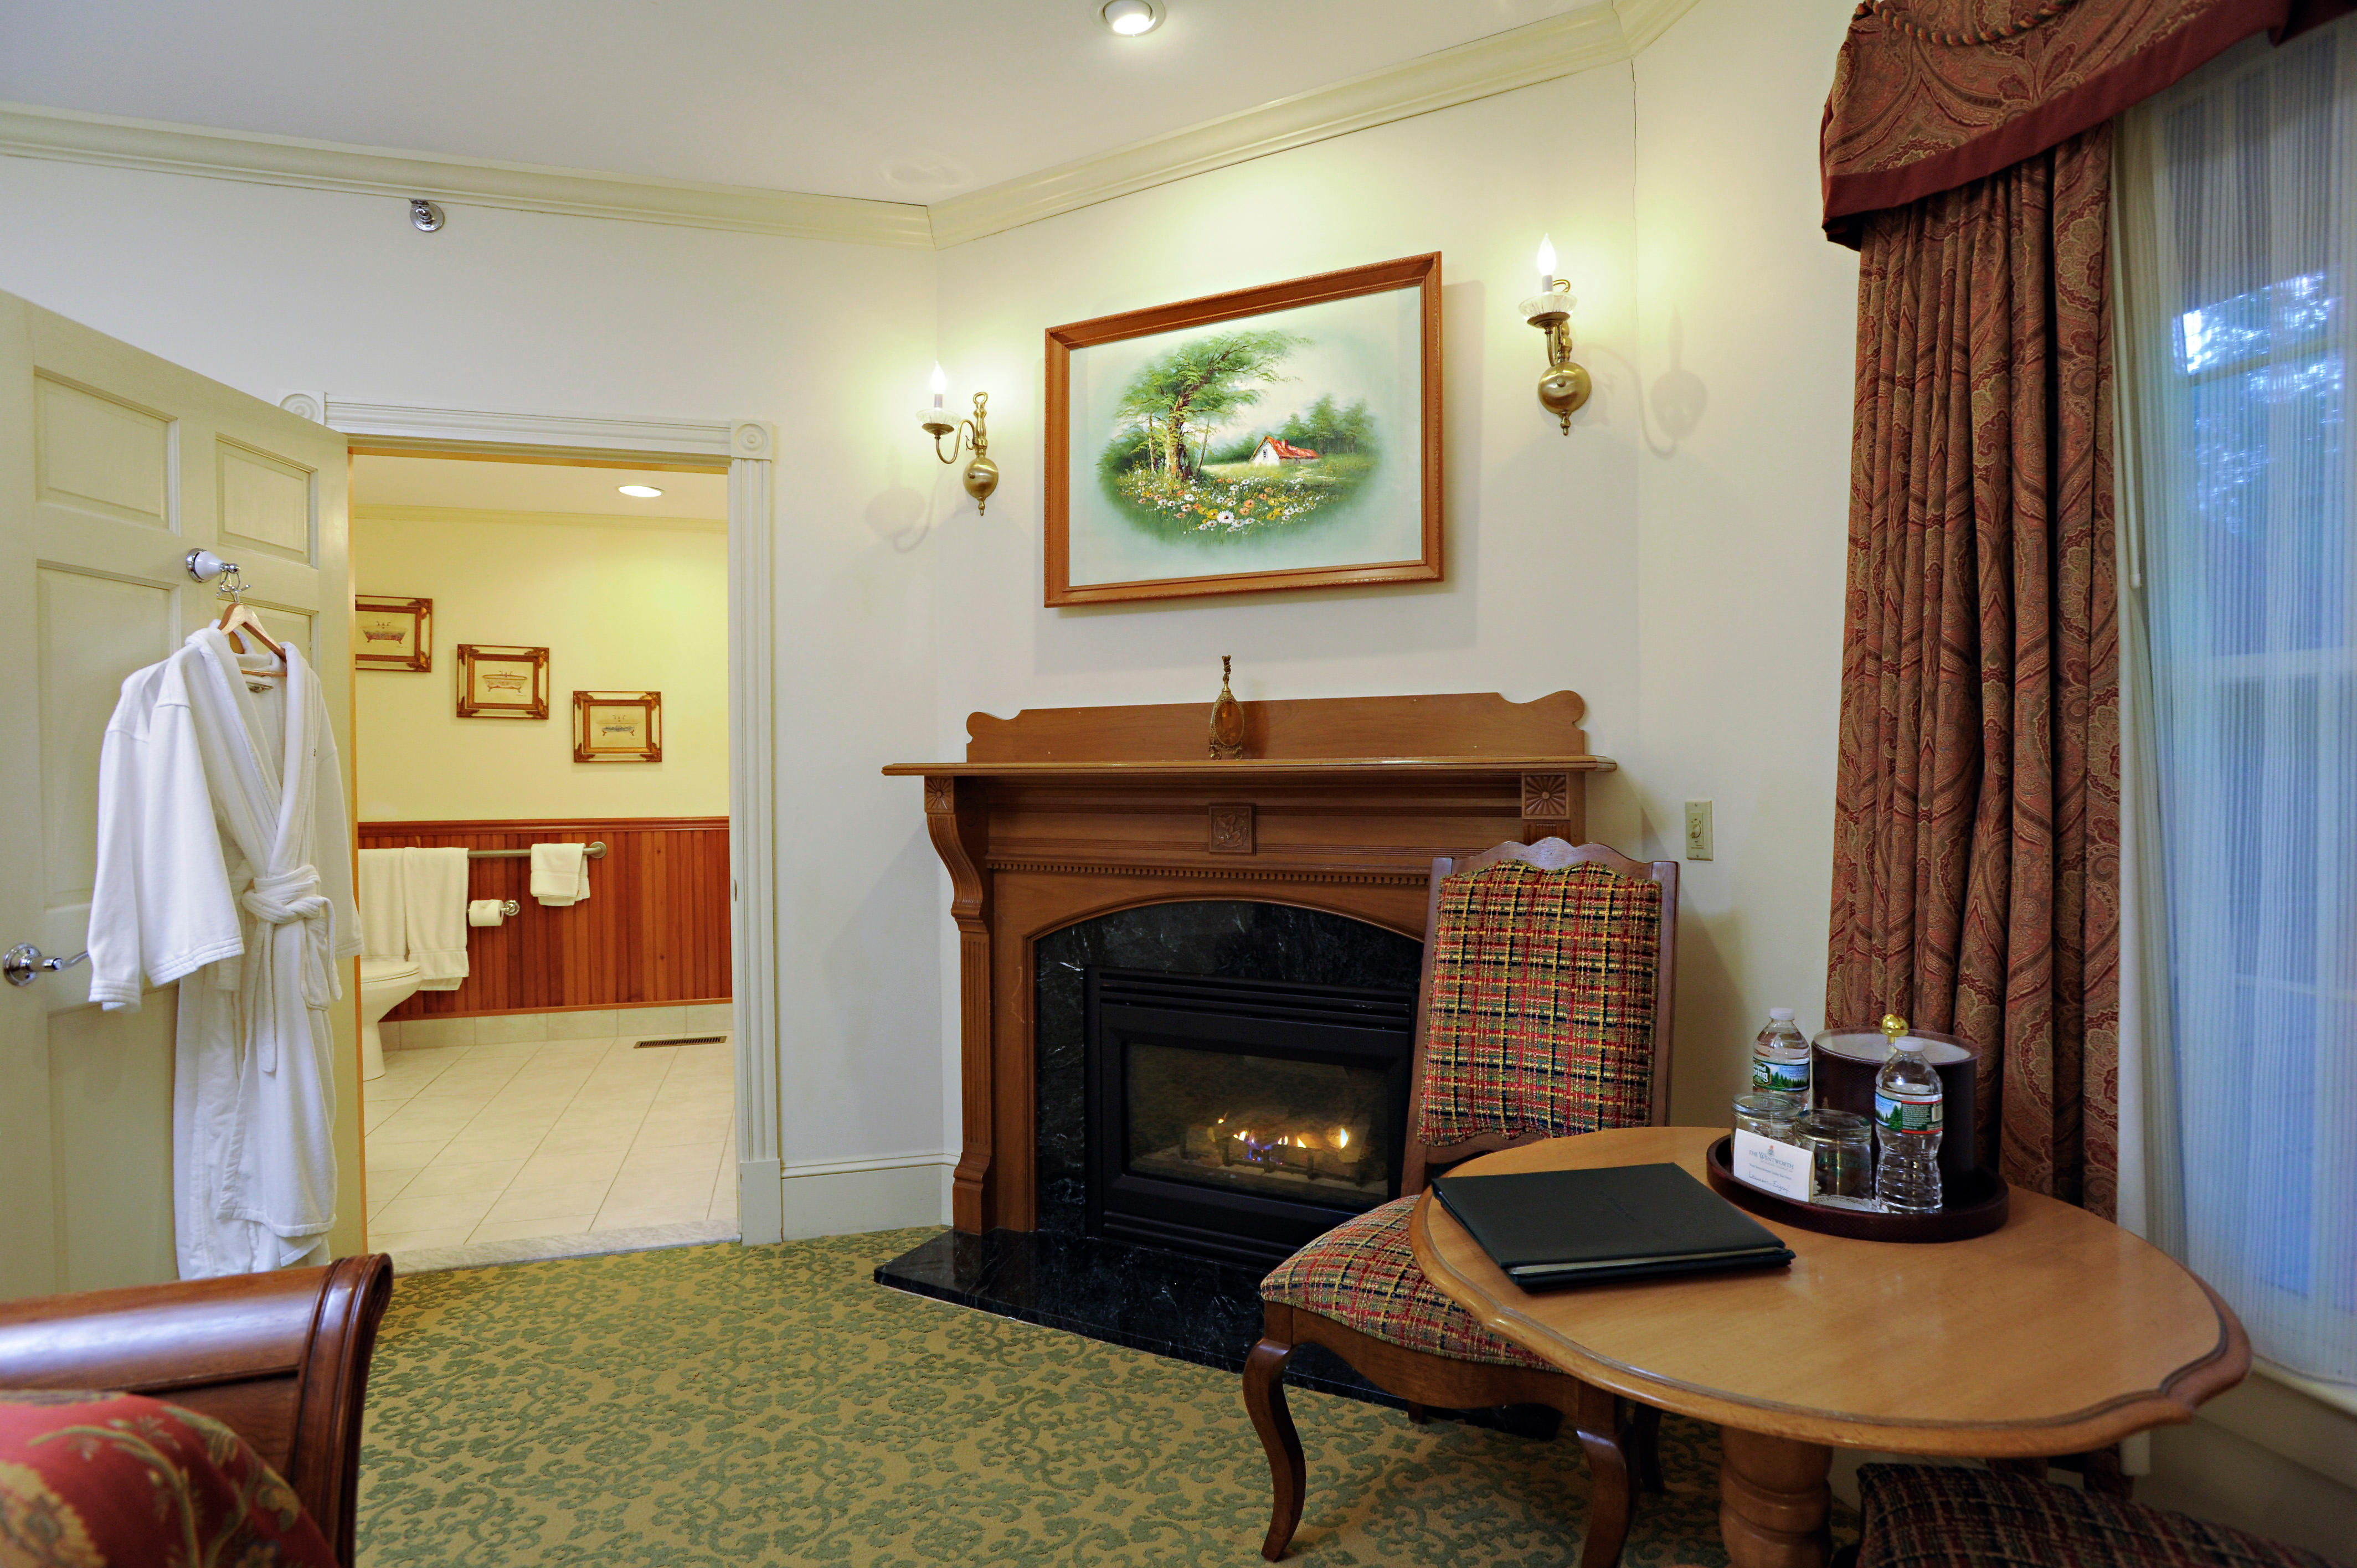 The Wentworth Inn image 7